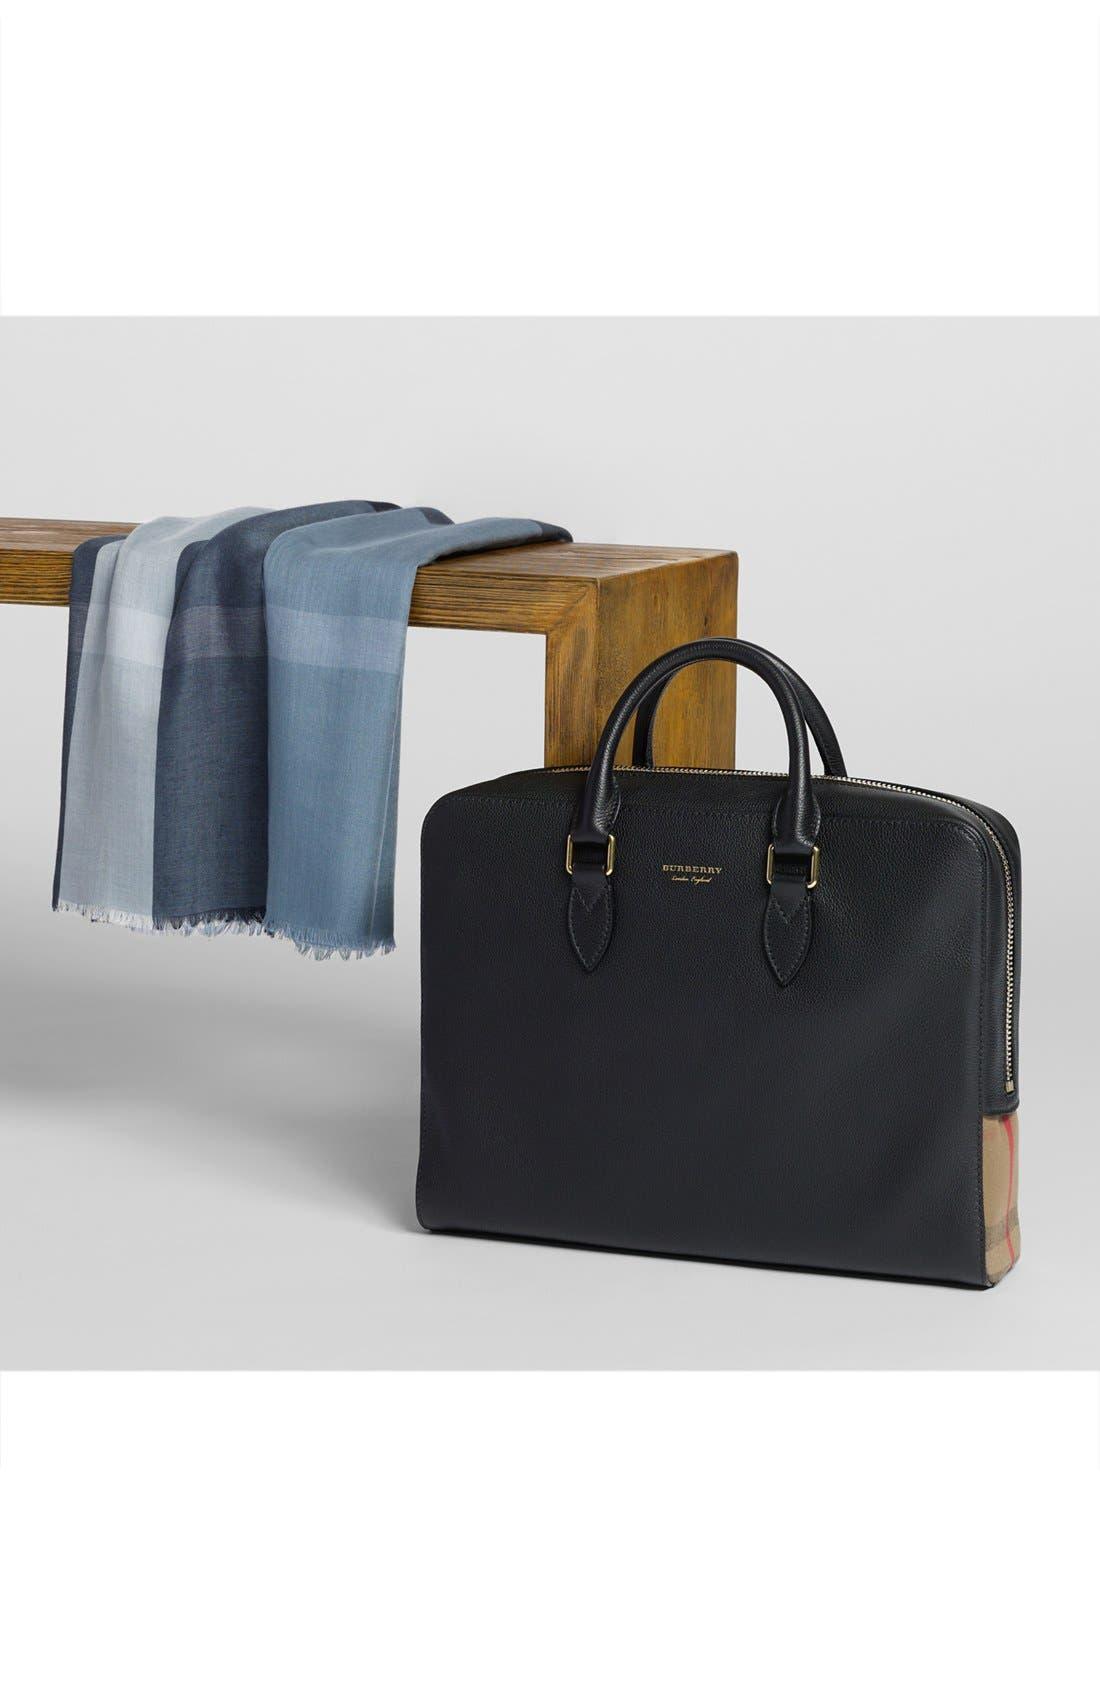 Horton Leather Briefcase,                             Alternate thumbnail 7, color,                             001